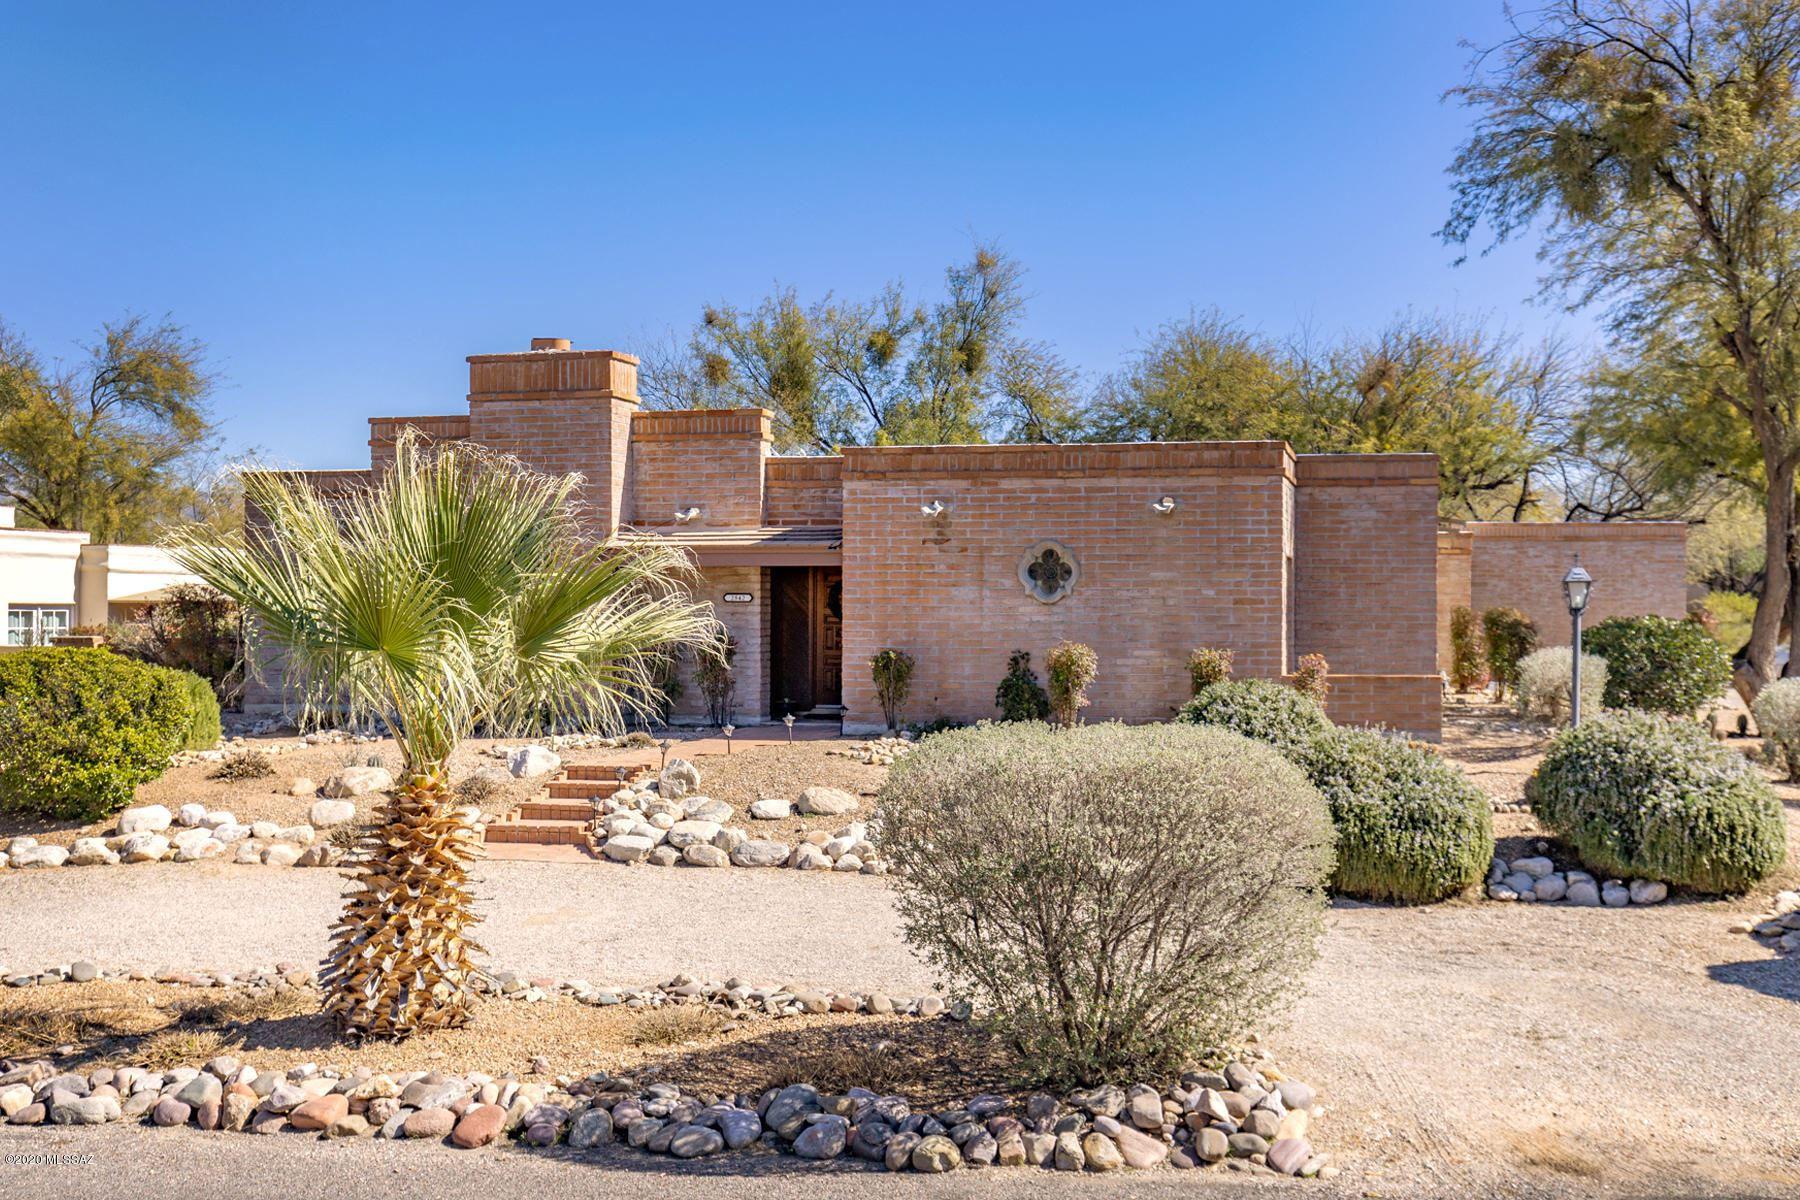 2842 N Calle Ladera, Tucson, AZ 85715 - #: 22026192